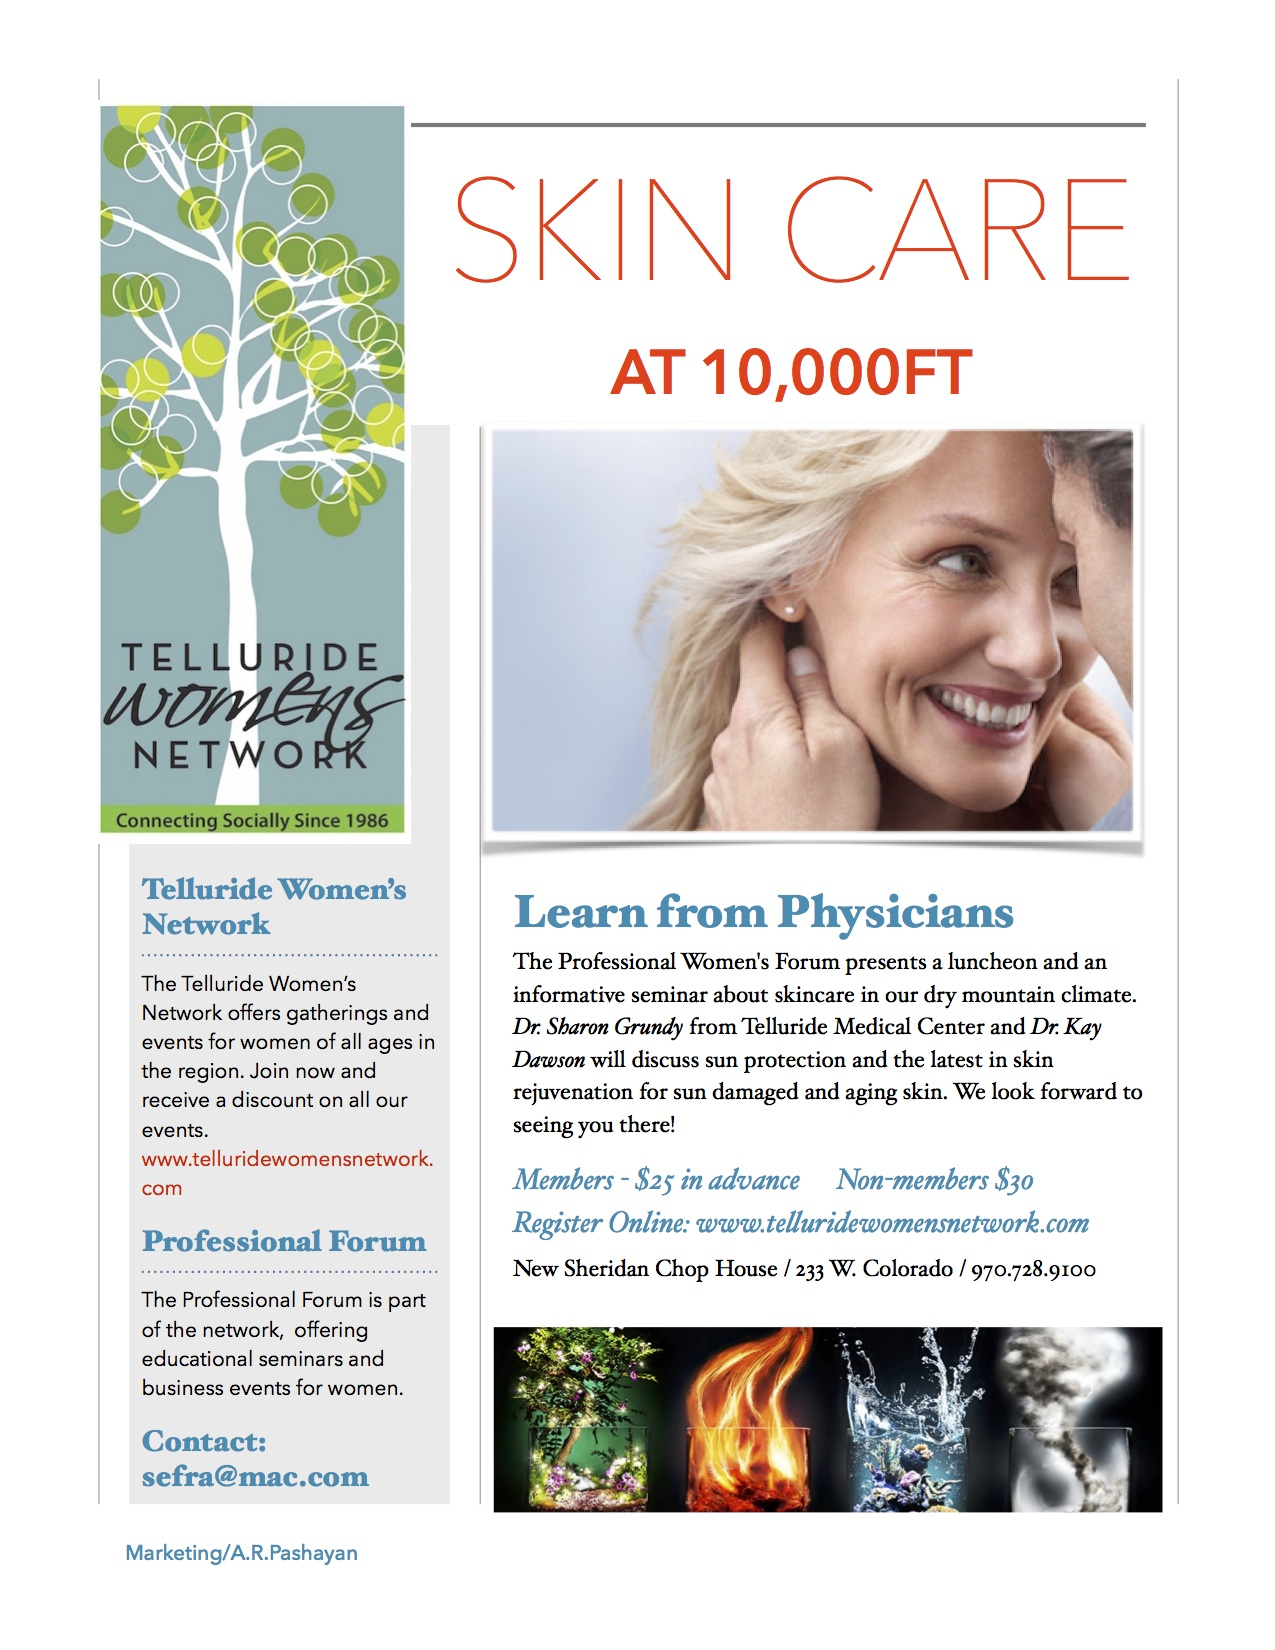 Skincare at 10,000 Feet: Drs  Grundy & Hamrick Featured | Telluride